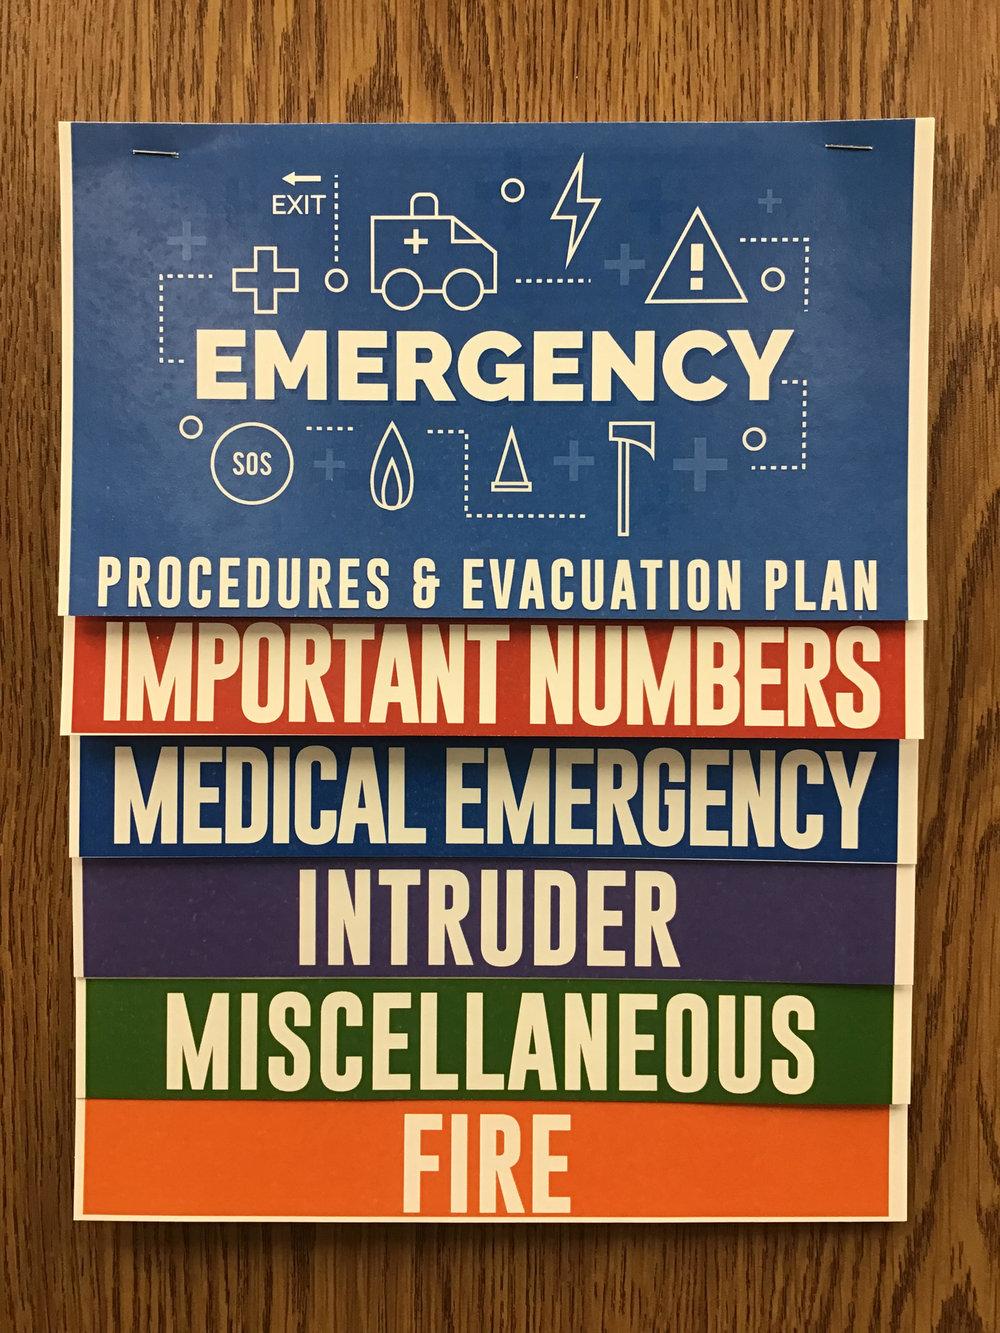 Emergency Procedures.jpg